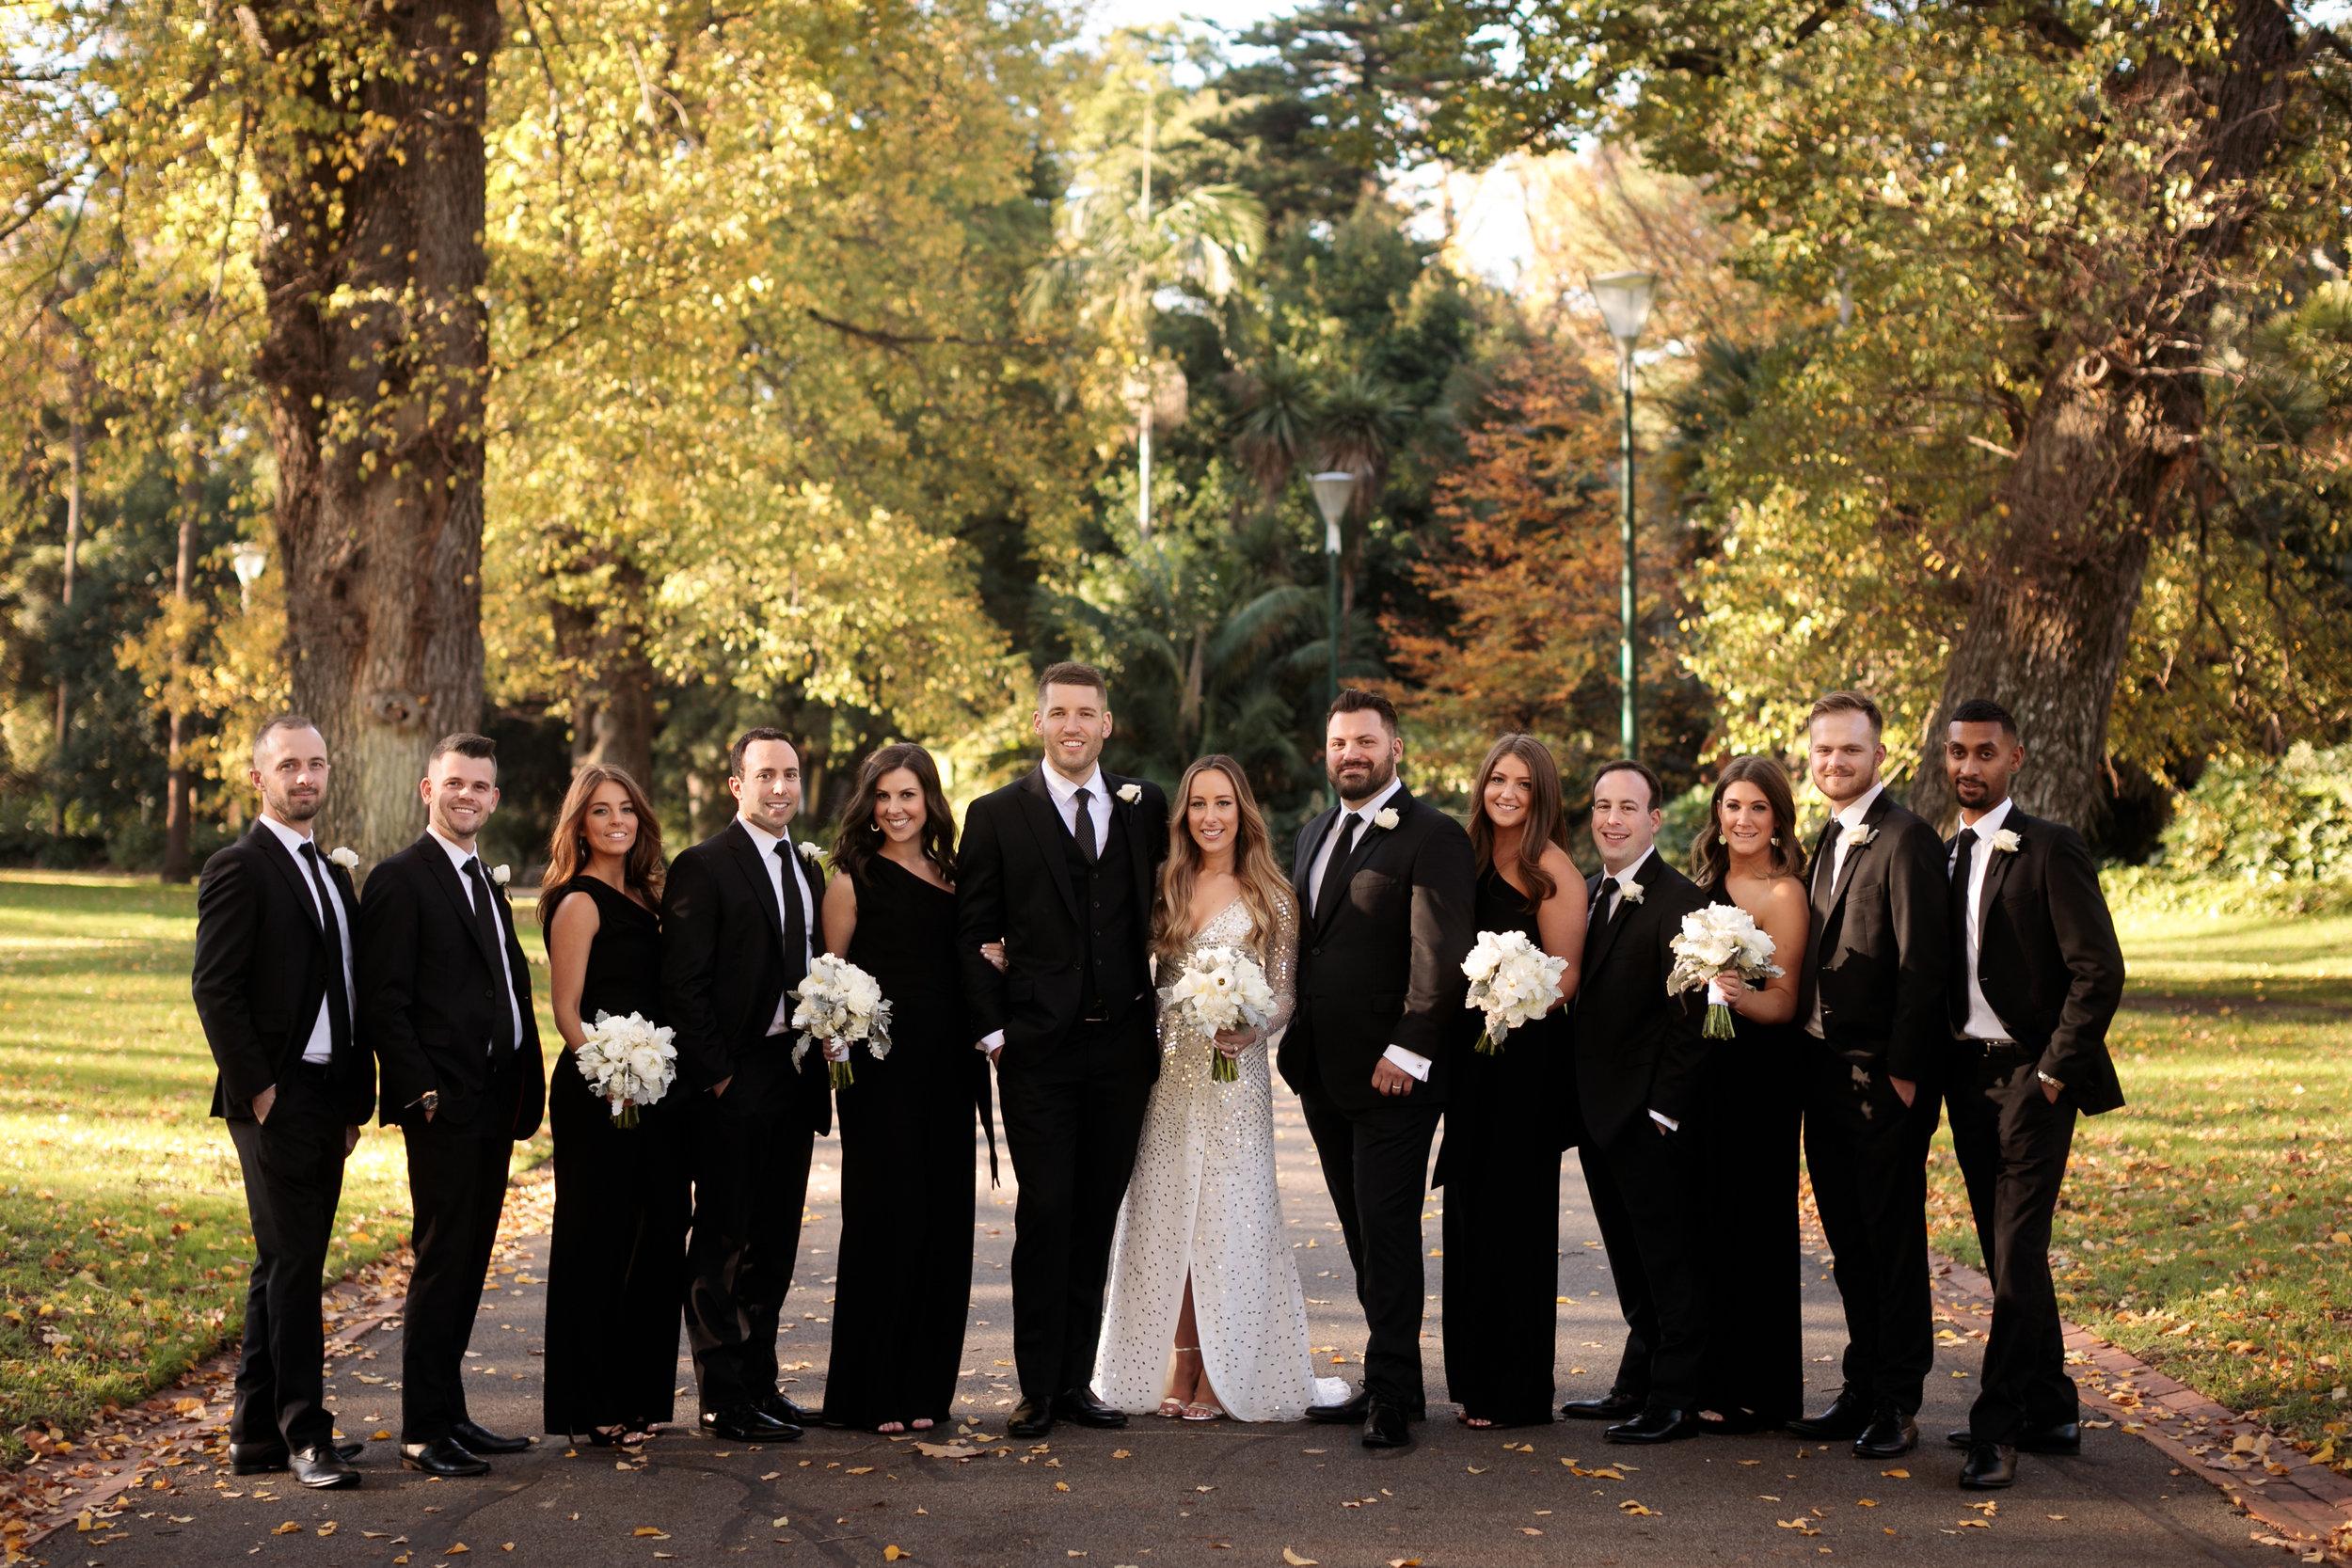 JEREMY-BLODE-Liza + James Wedding Highlights-26.jpg